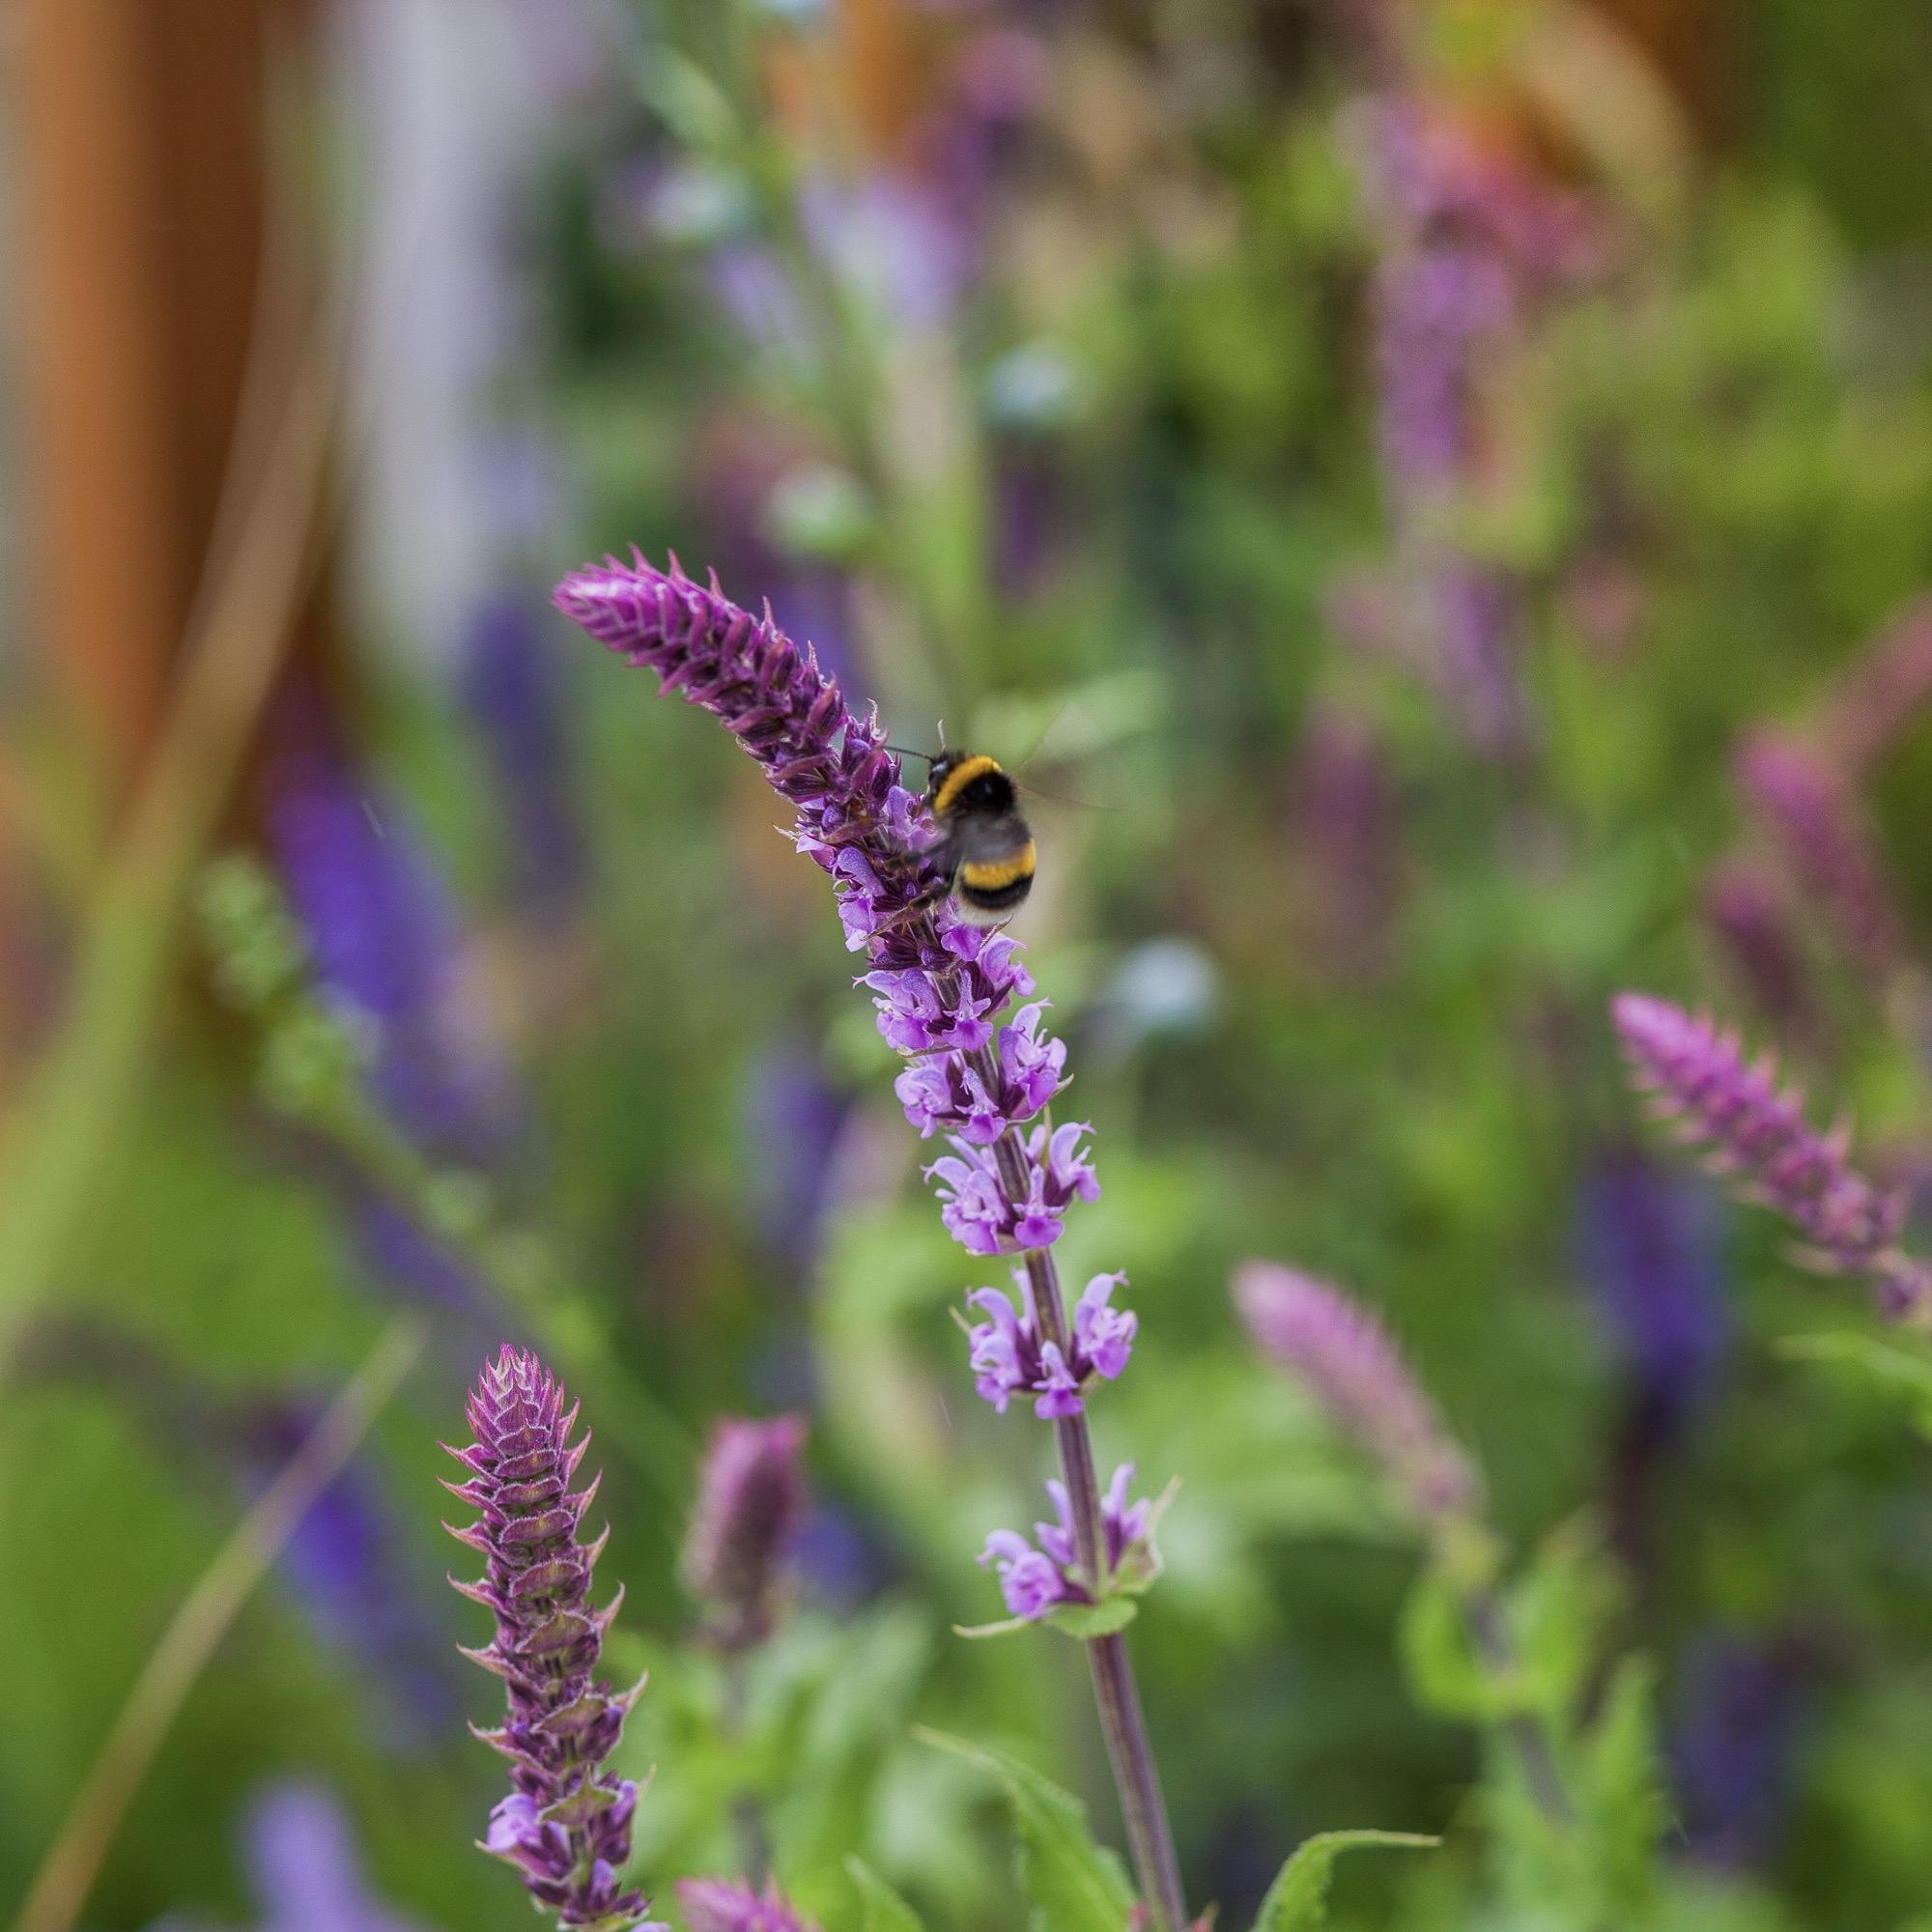 a bee on a beautiful salvia flower design by Leonie Cornelius